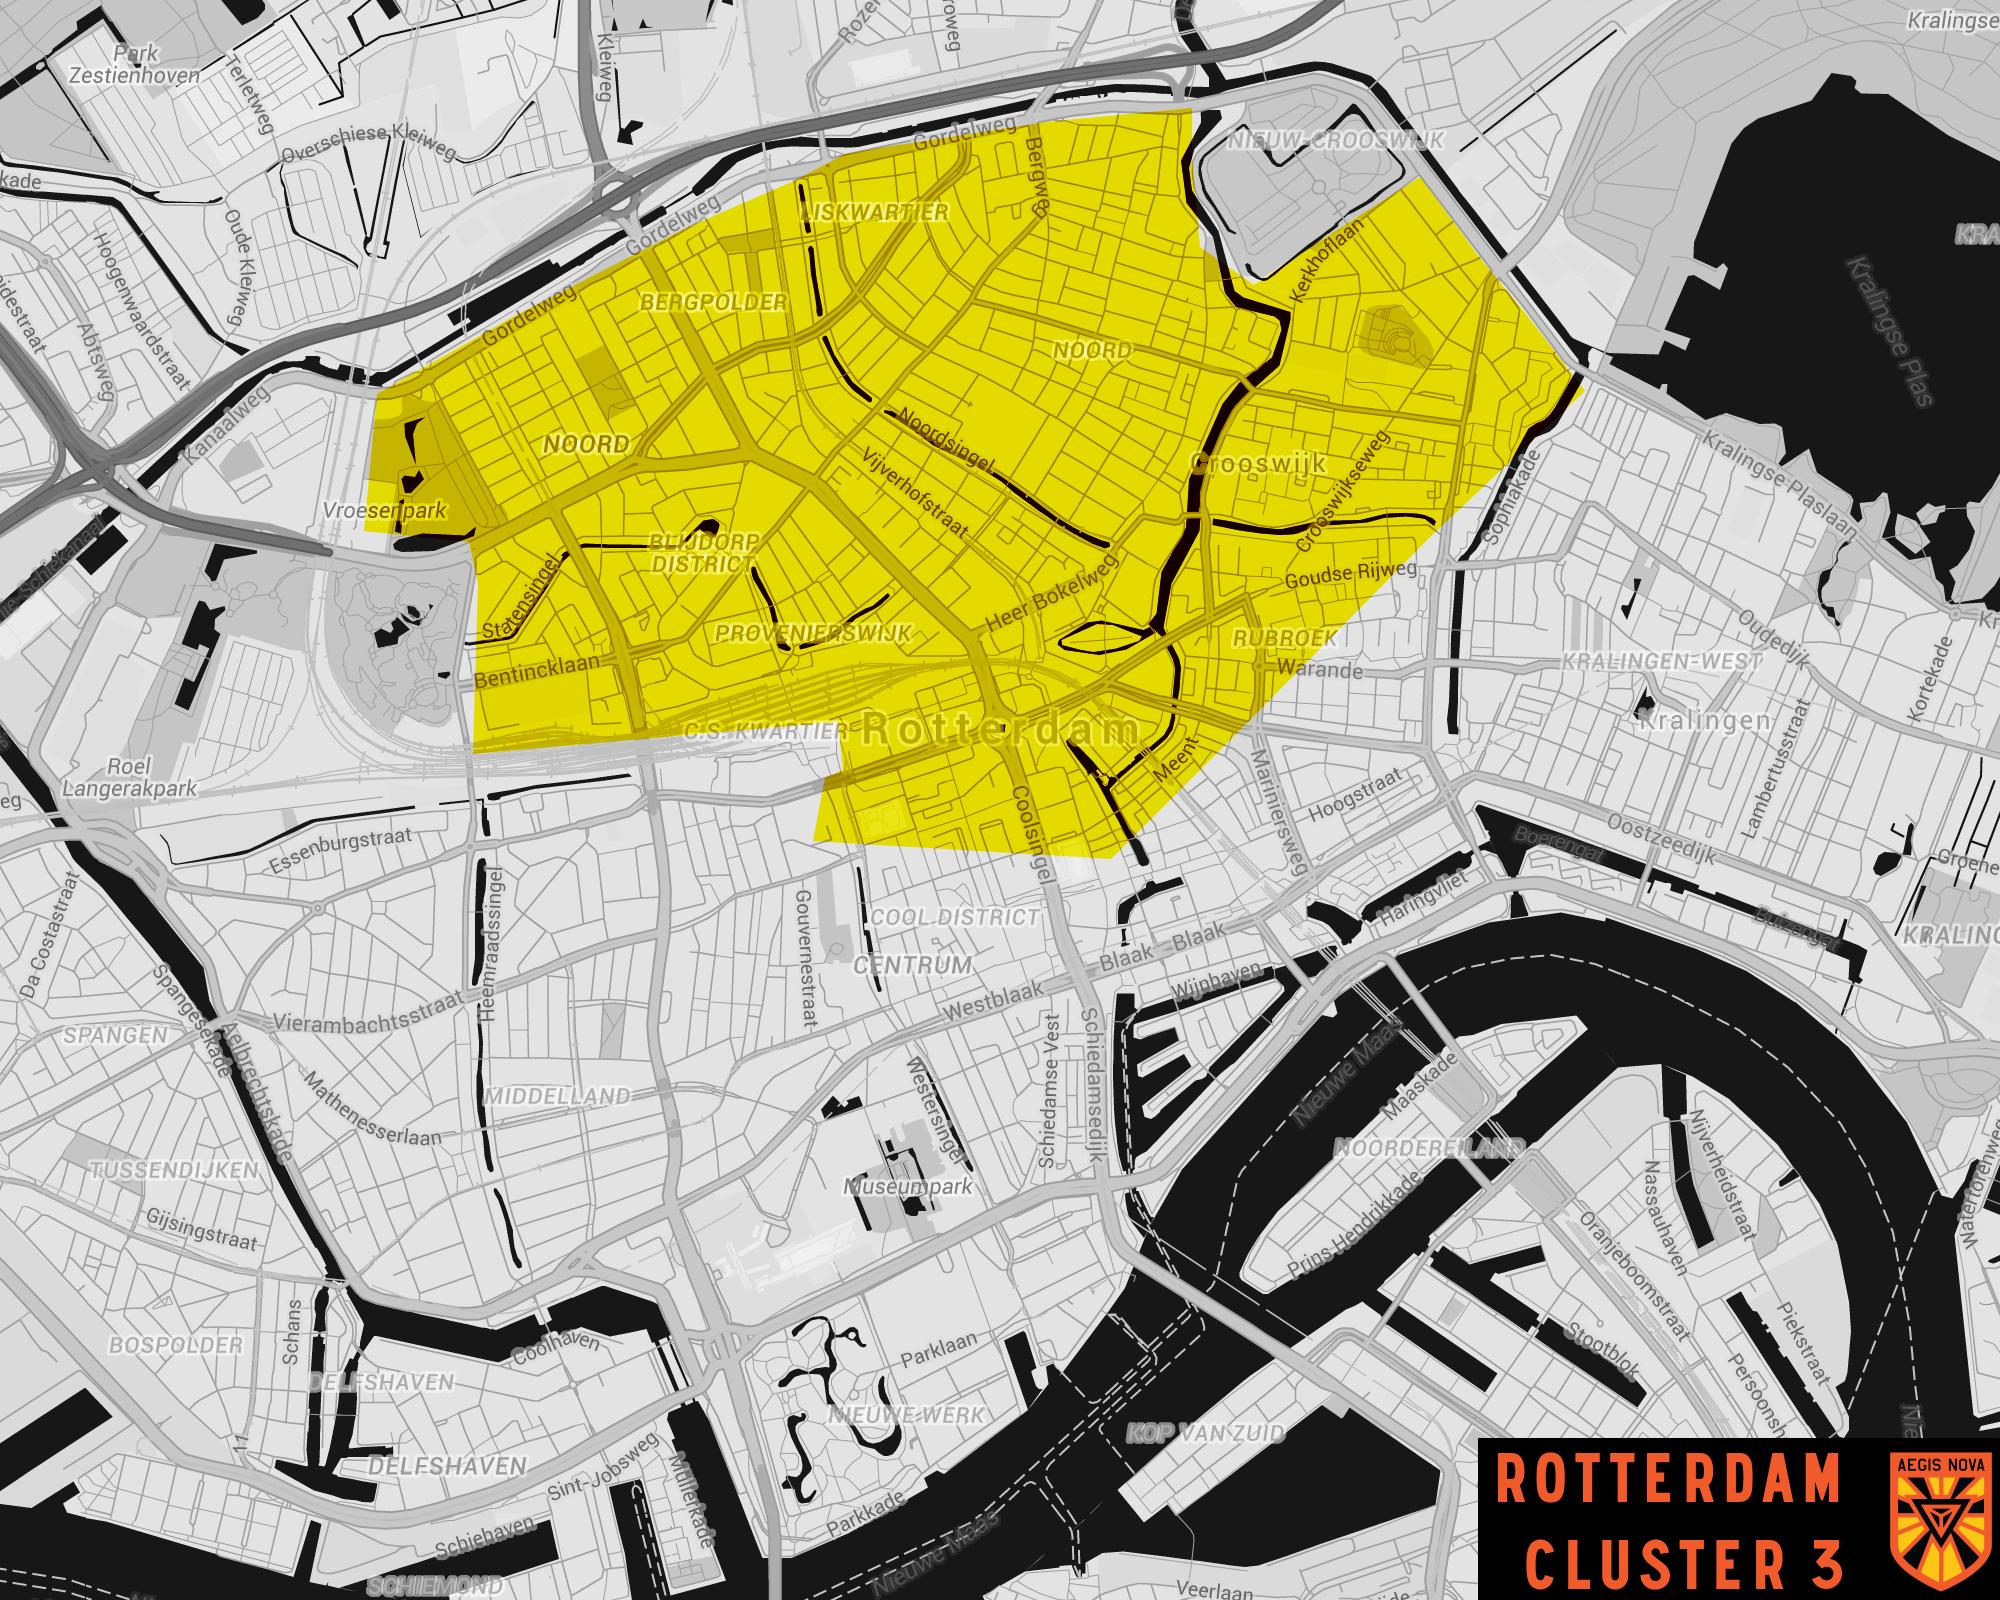 RotterdamCluster3.png